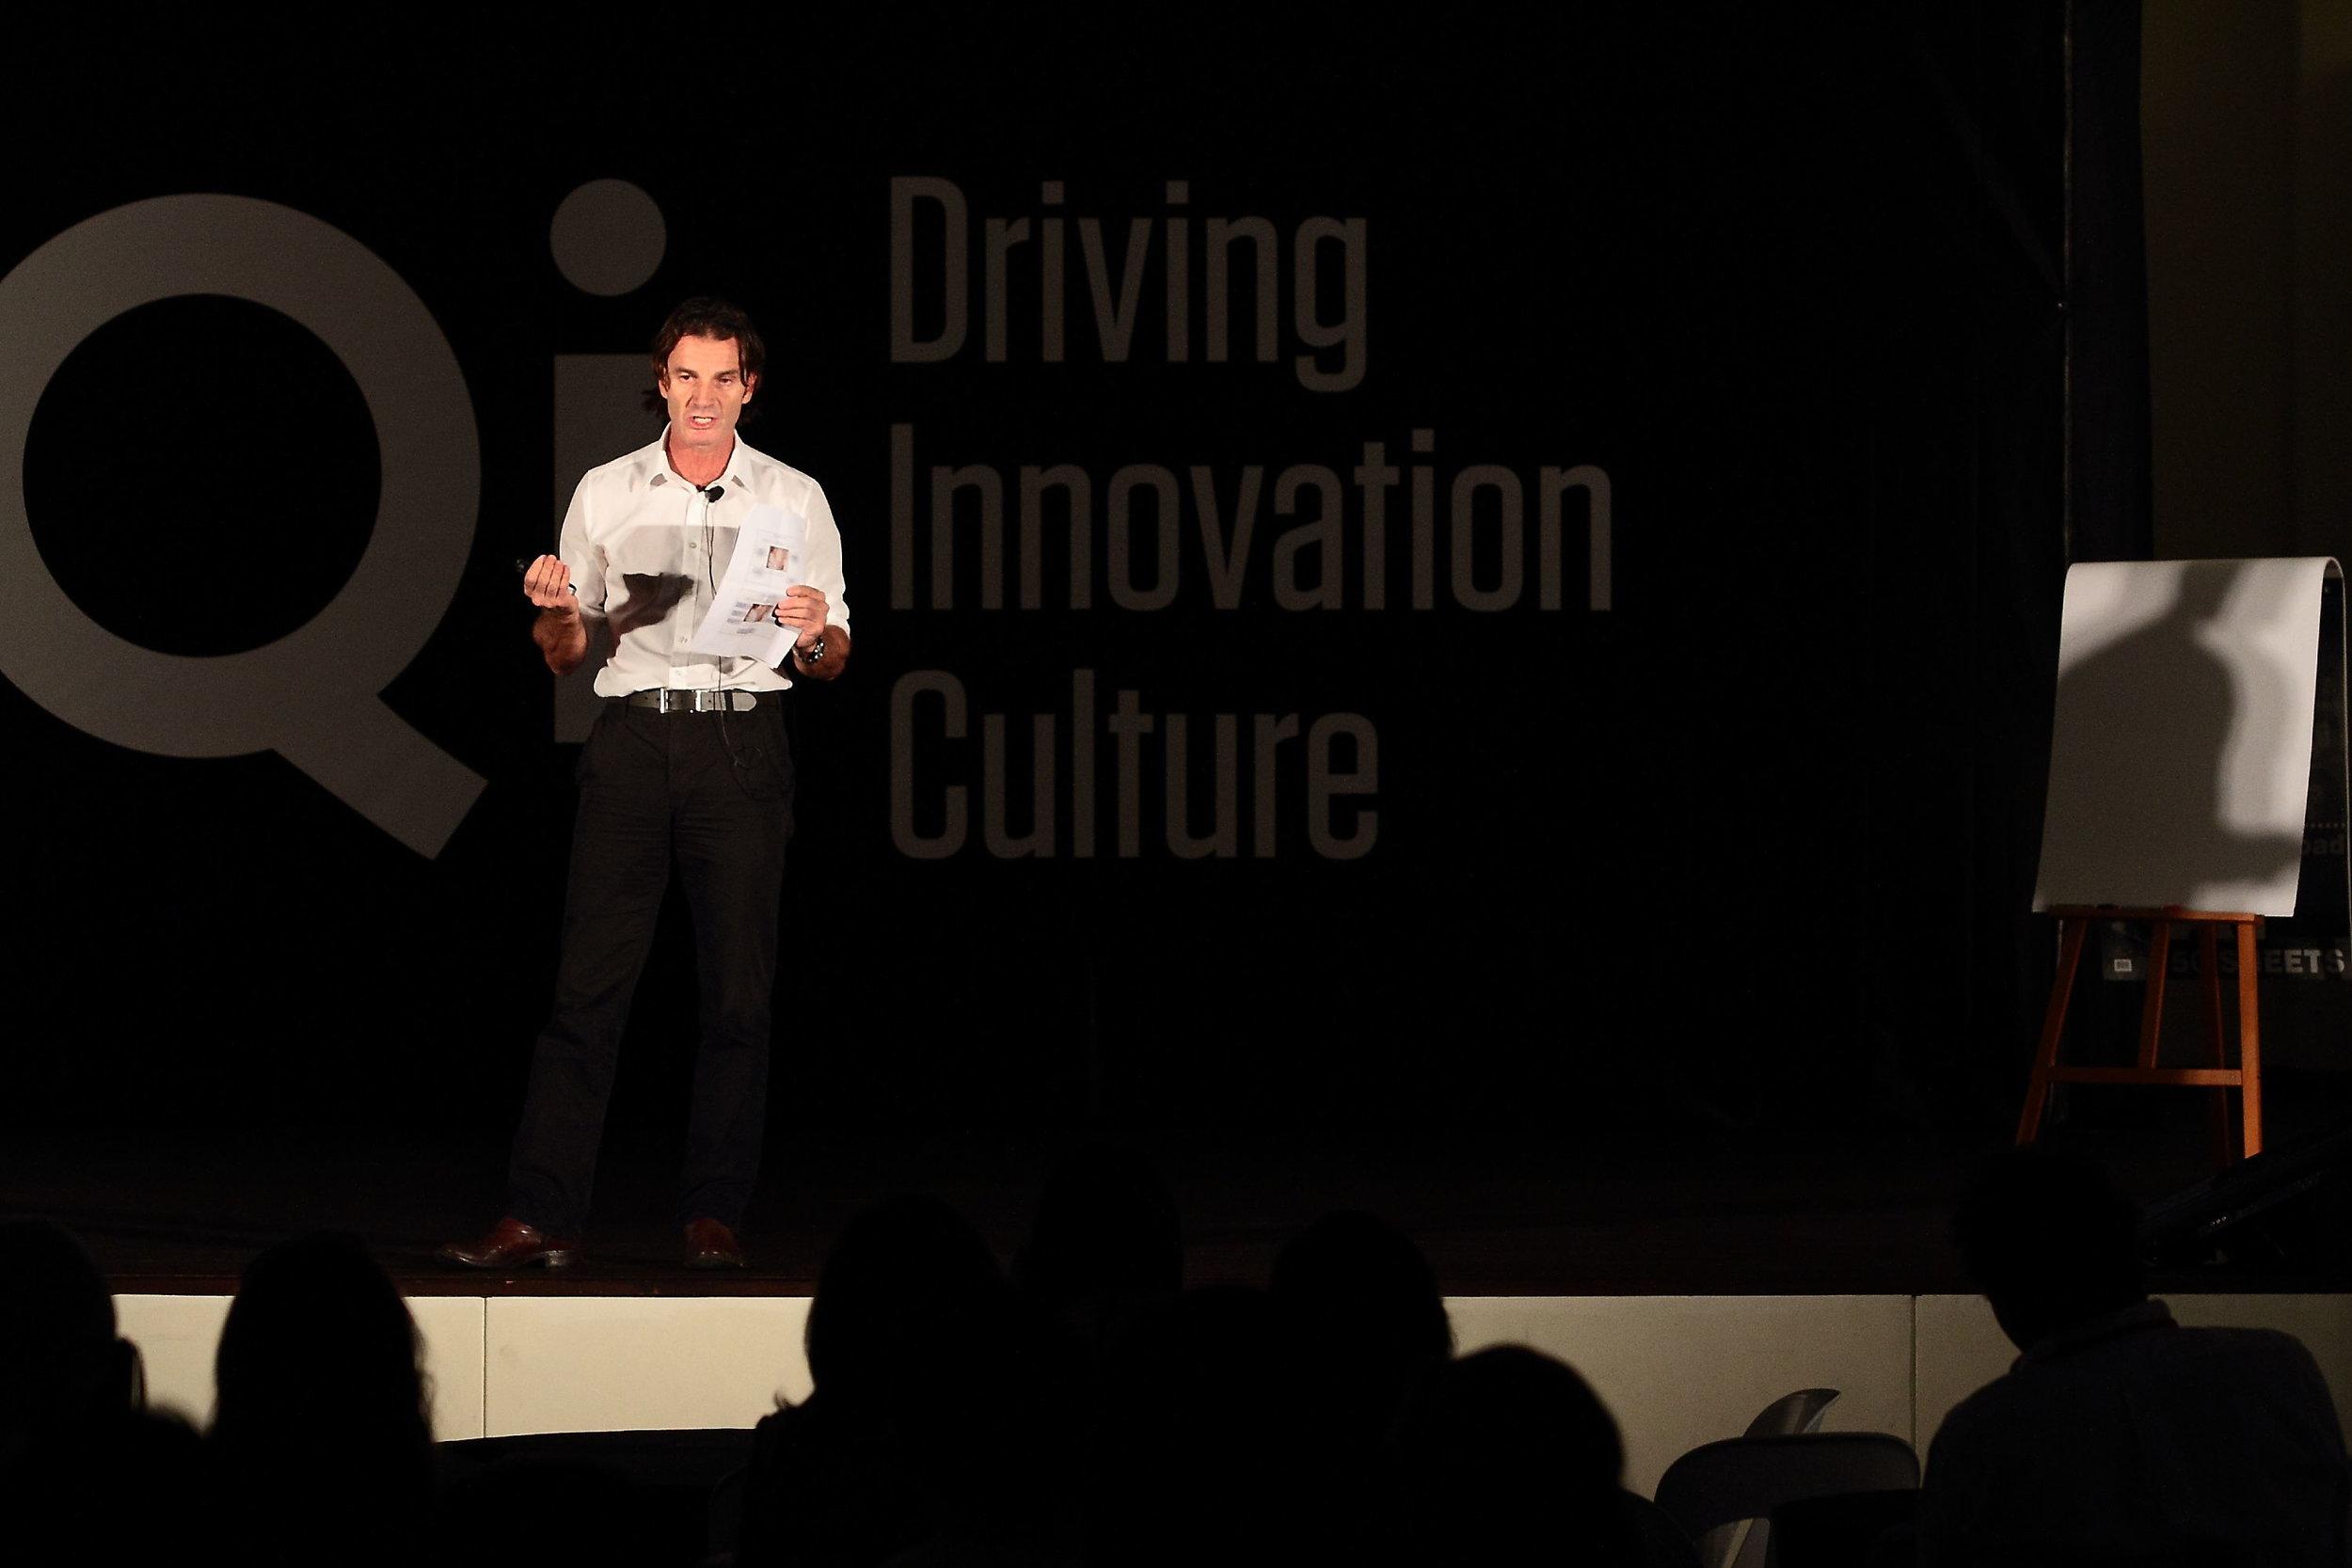 qi-global-2011-driving-innovation-culture-069.jpg